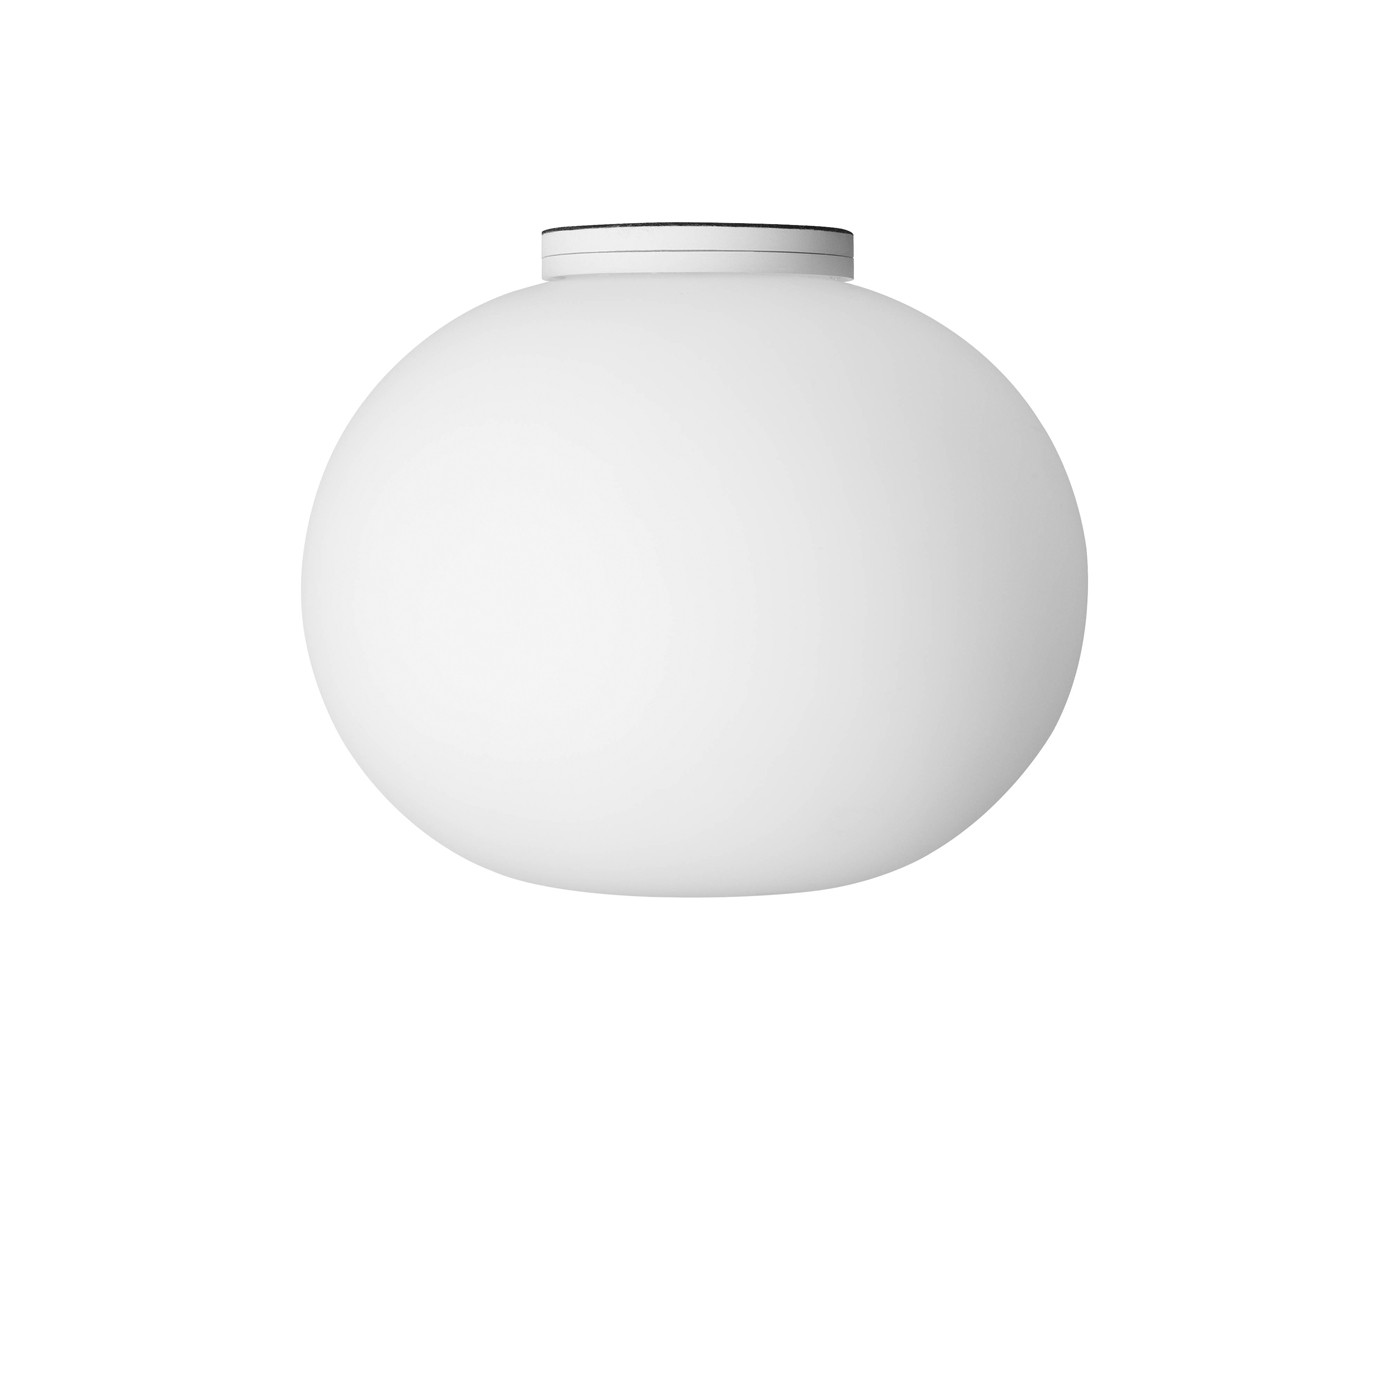 Flos Glo-Ball Zero C/W